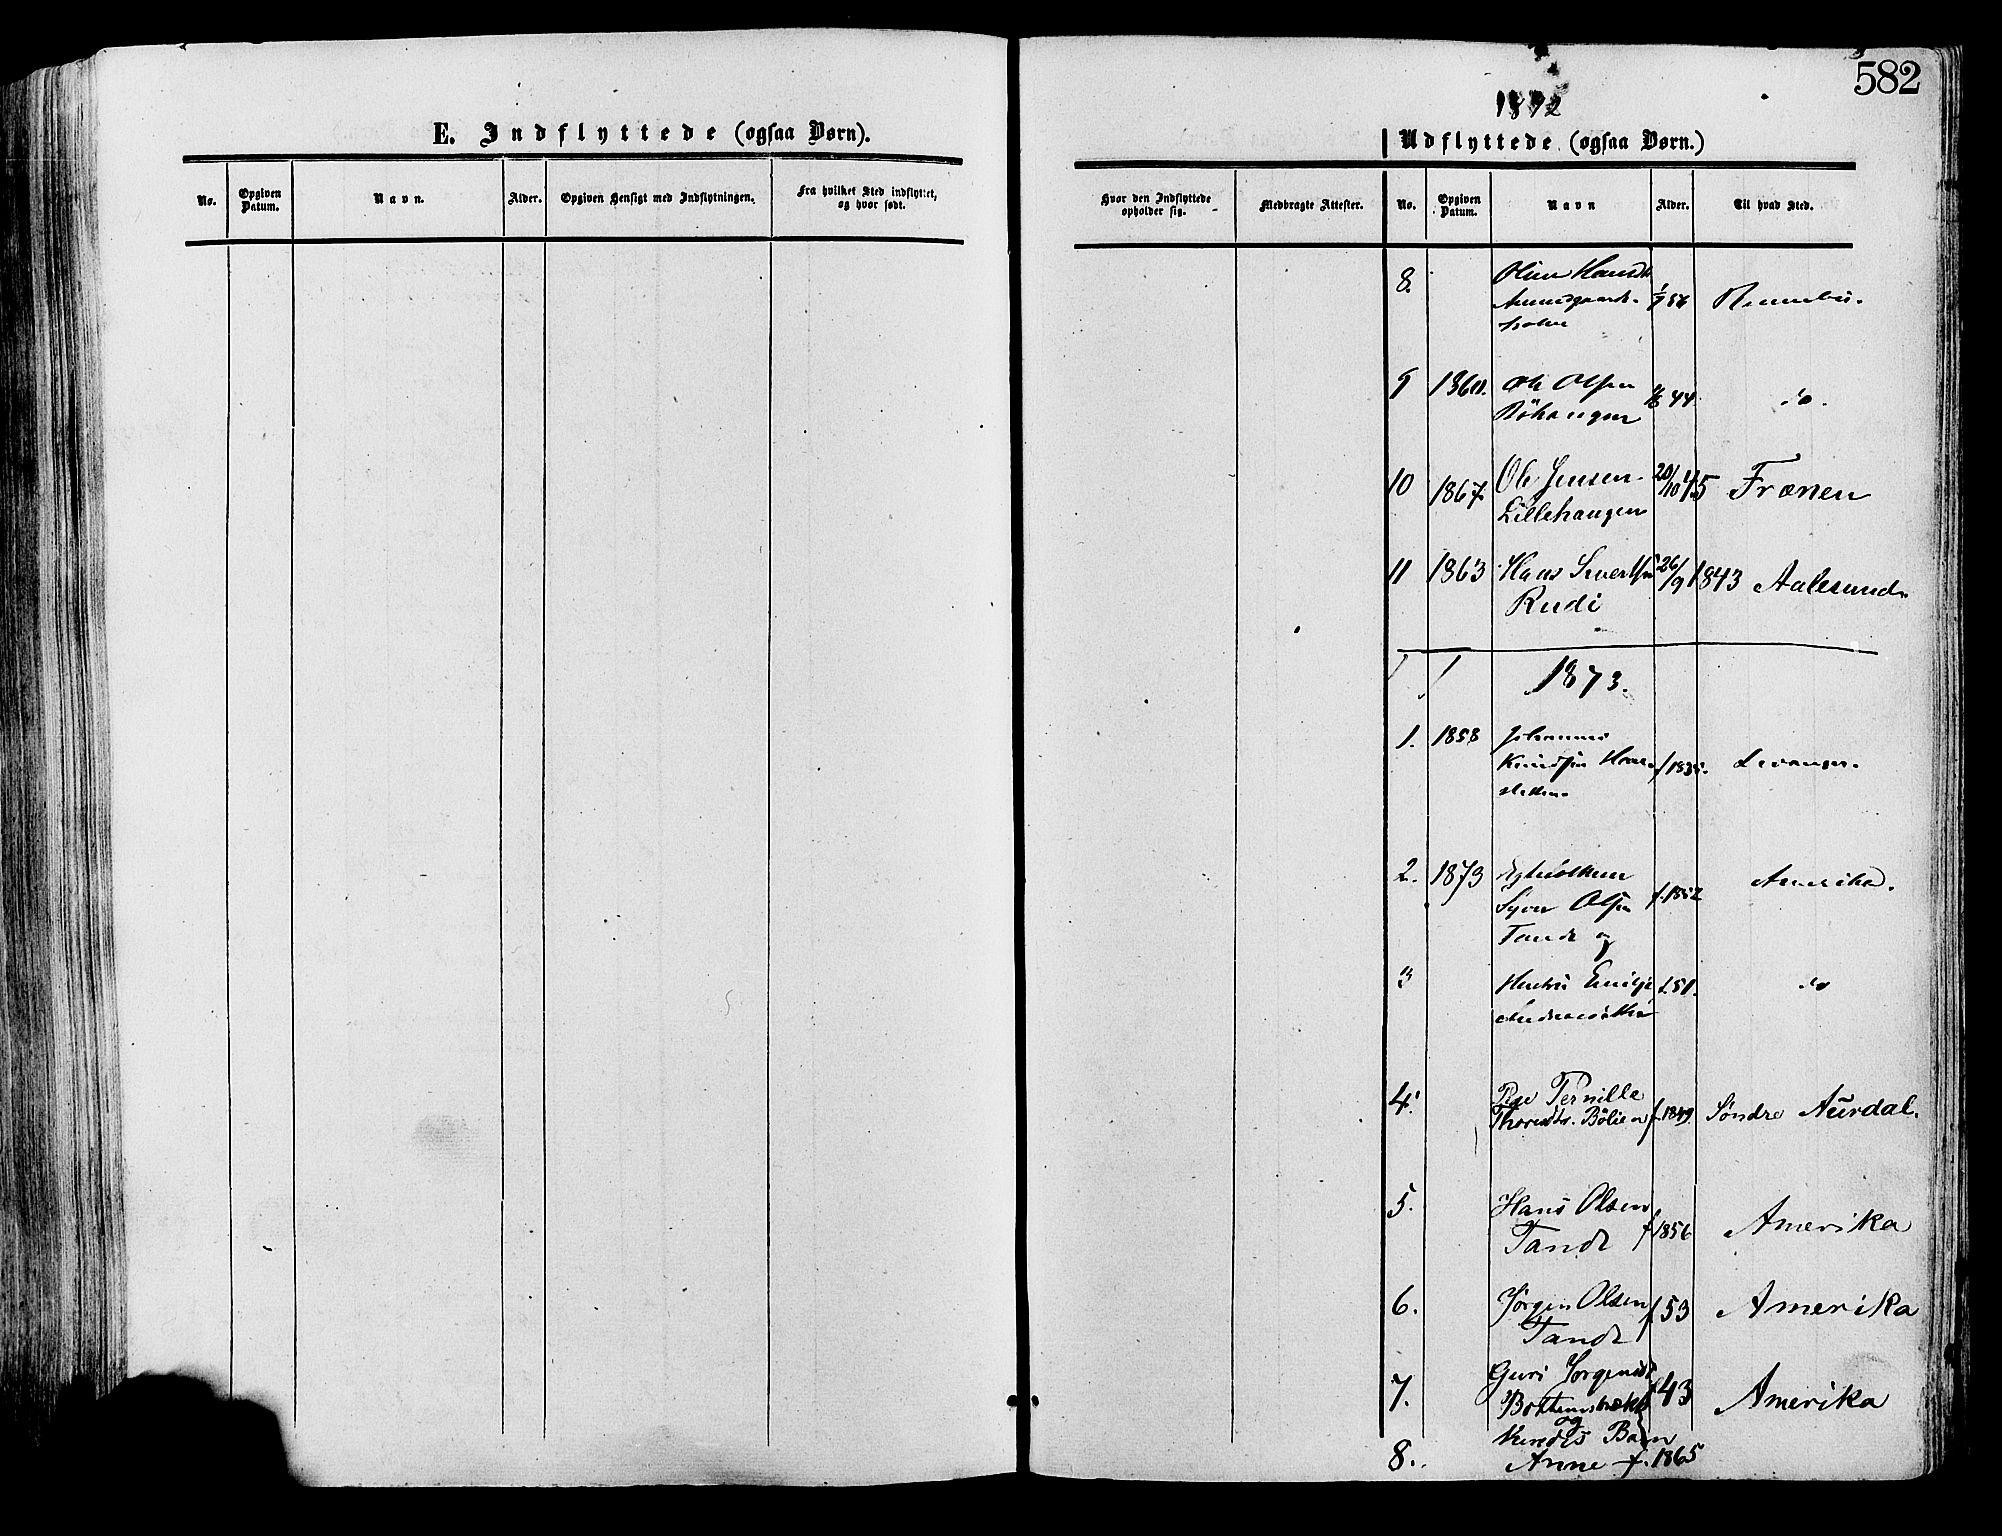 SAH, Lesja prestekontor, Ministerialbok nr. 8, 1854-1880, s. 582